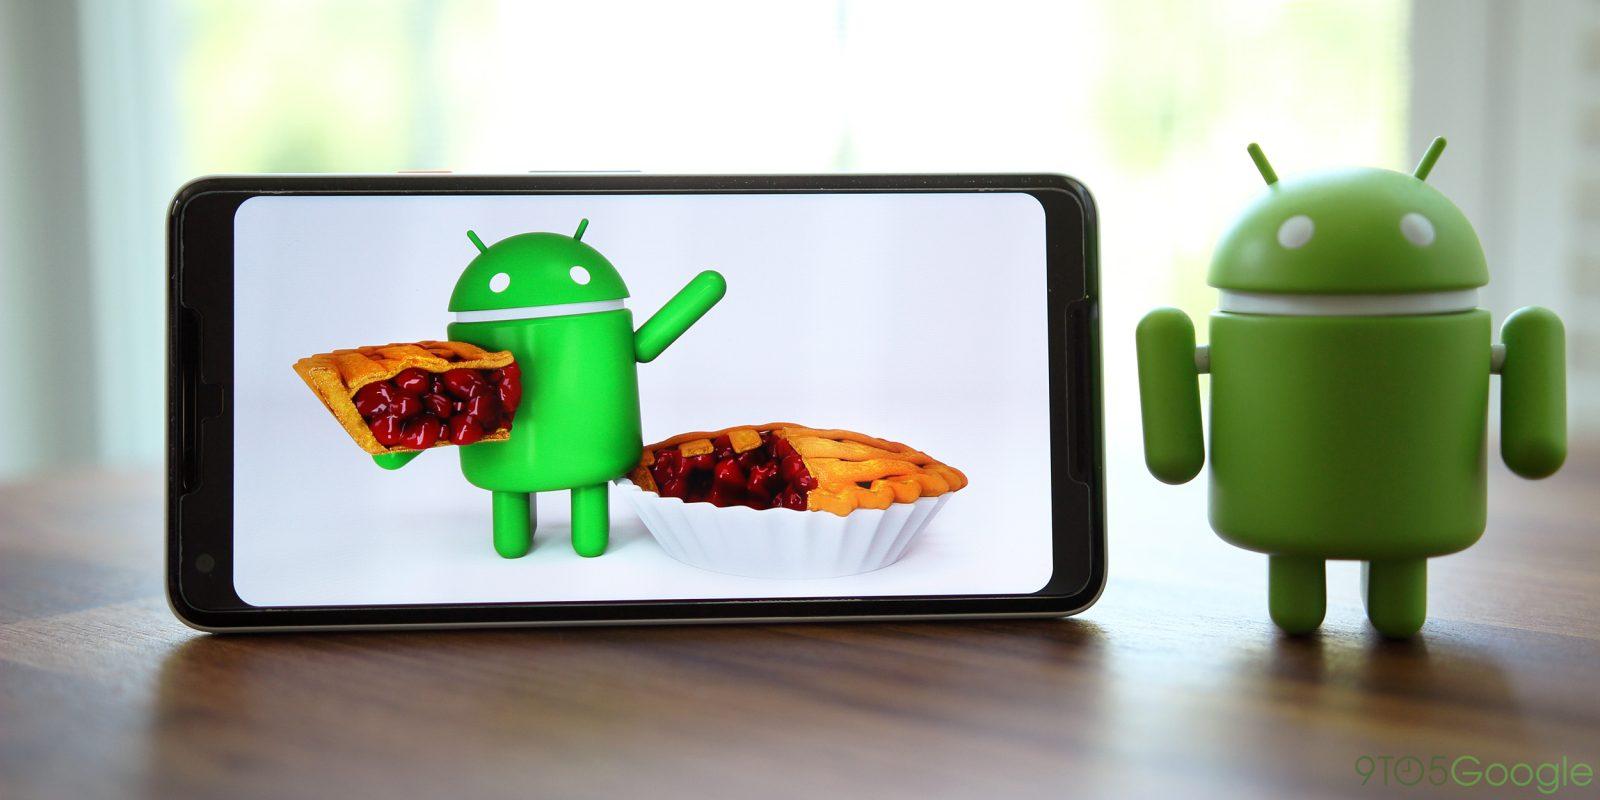 Android 9 Pie upgrades confirmed for Sony Xperia XZ1, XZ2, HTC U12+